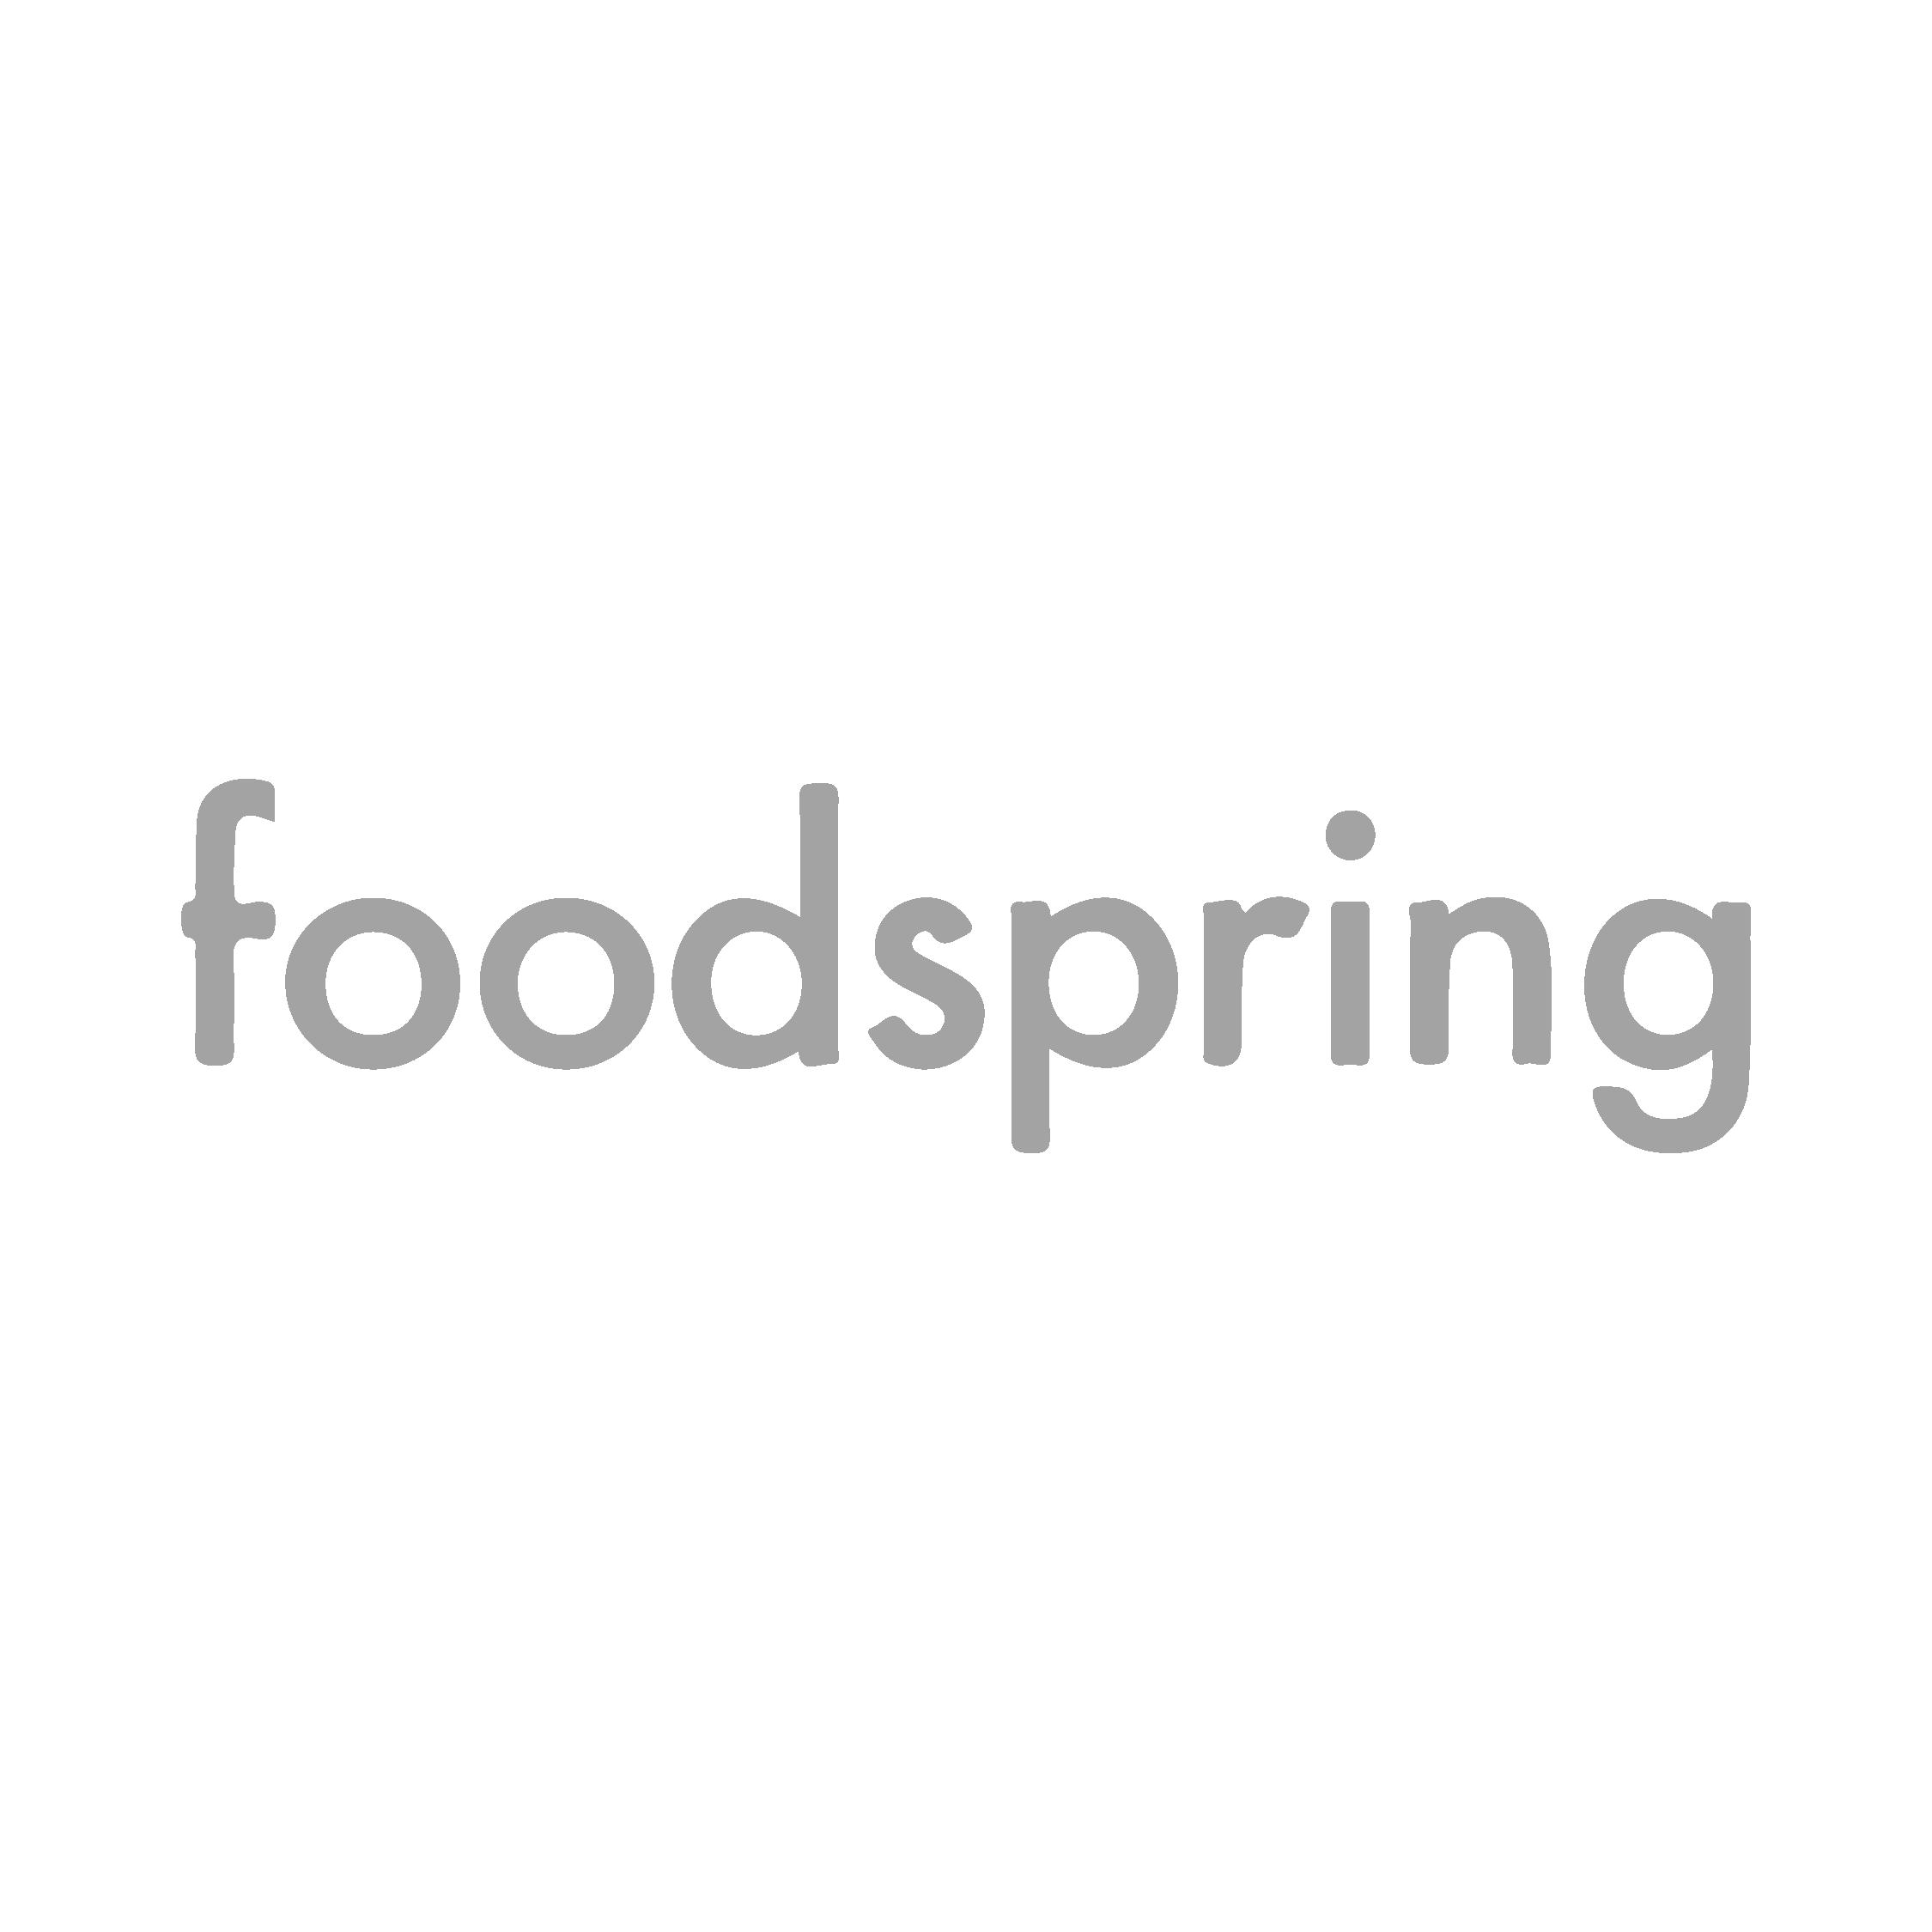 Logo Foodspring - Agence de communication Break-Out Company